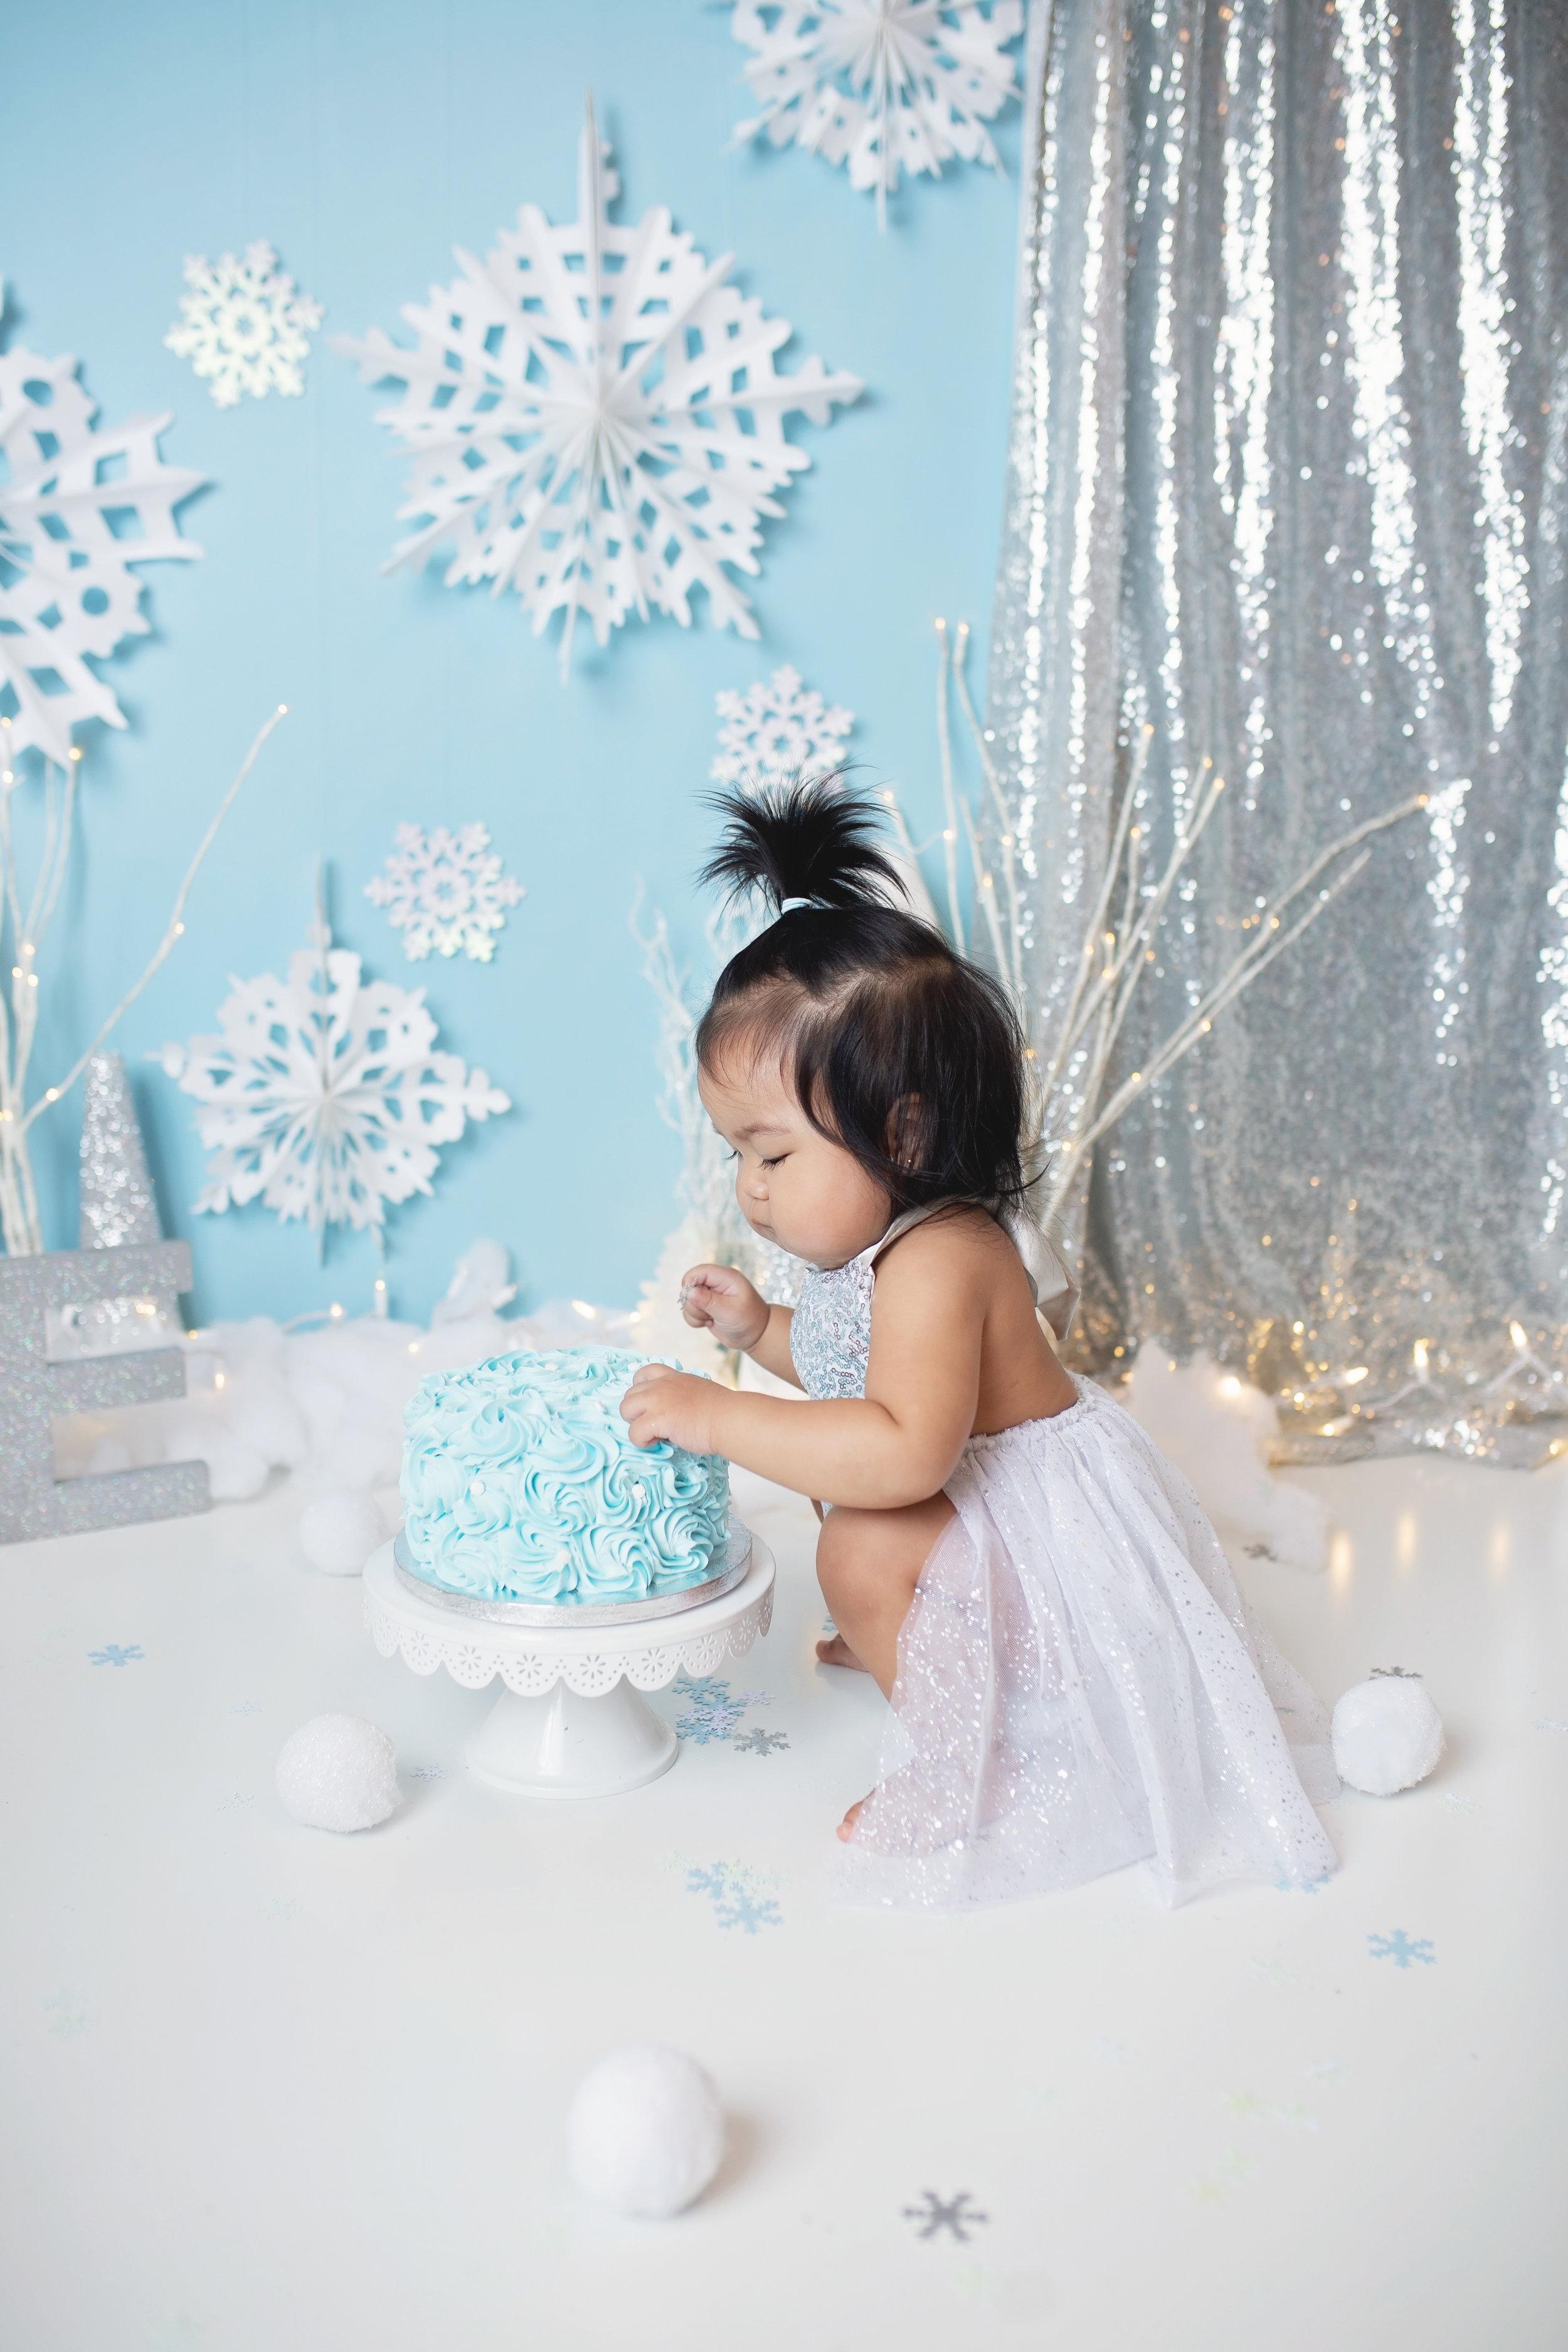 anchorage-cake-smash-photographer-7.jpg